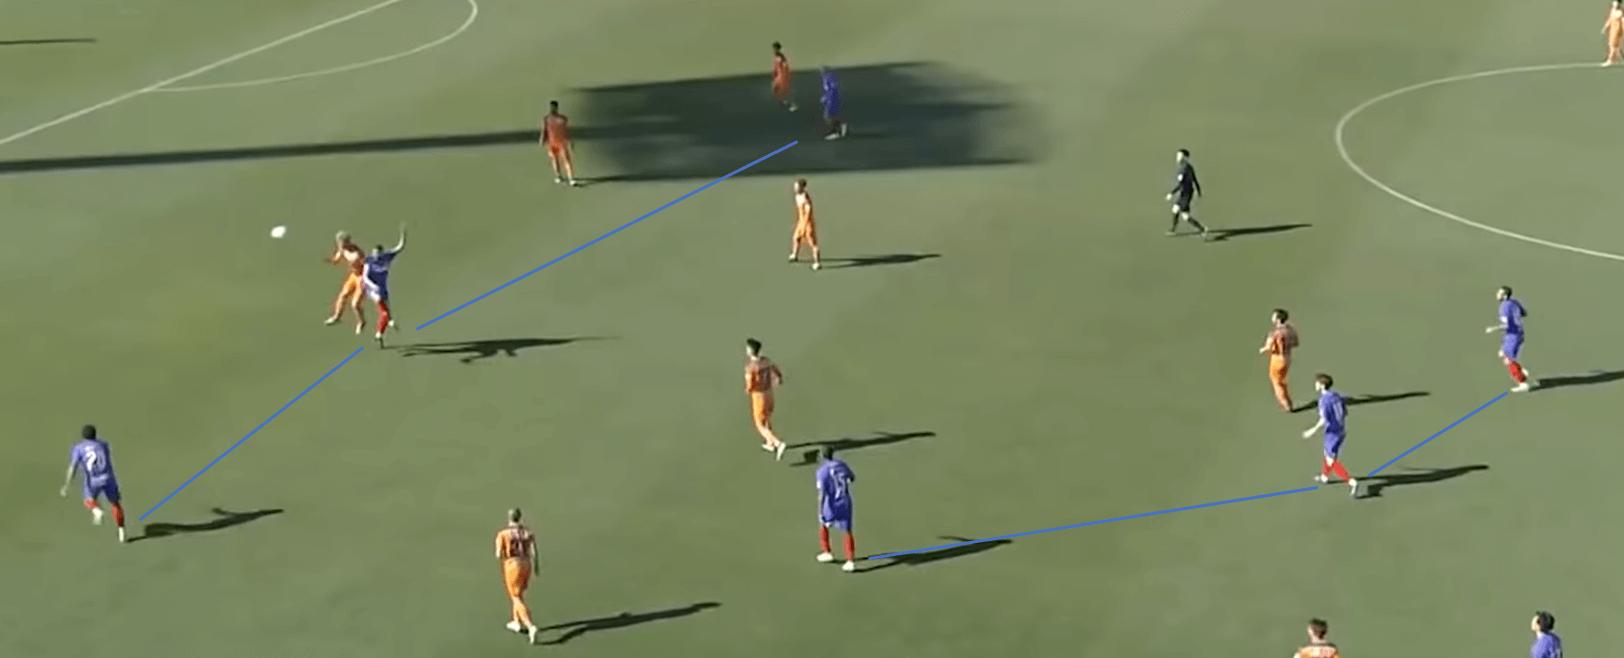 FC Tokyo 2020: Team analysis – scout report tactics